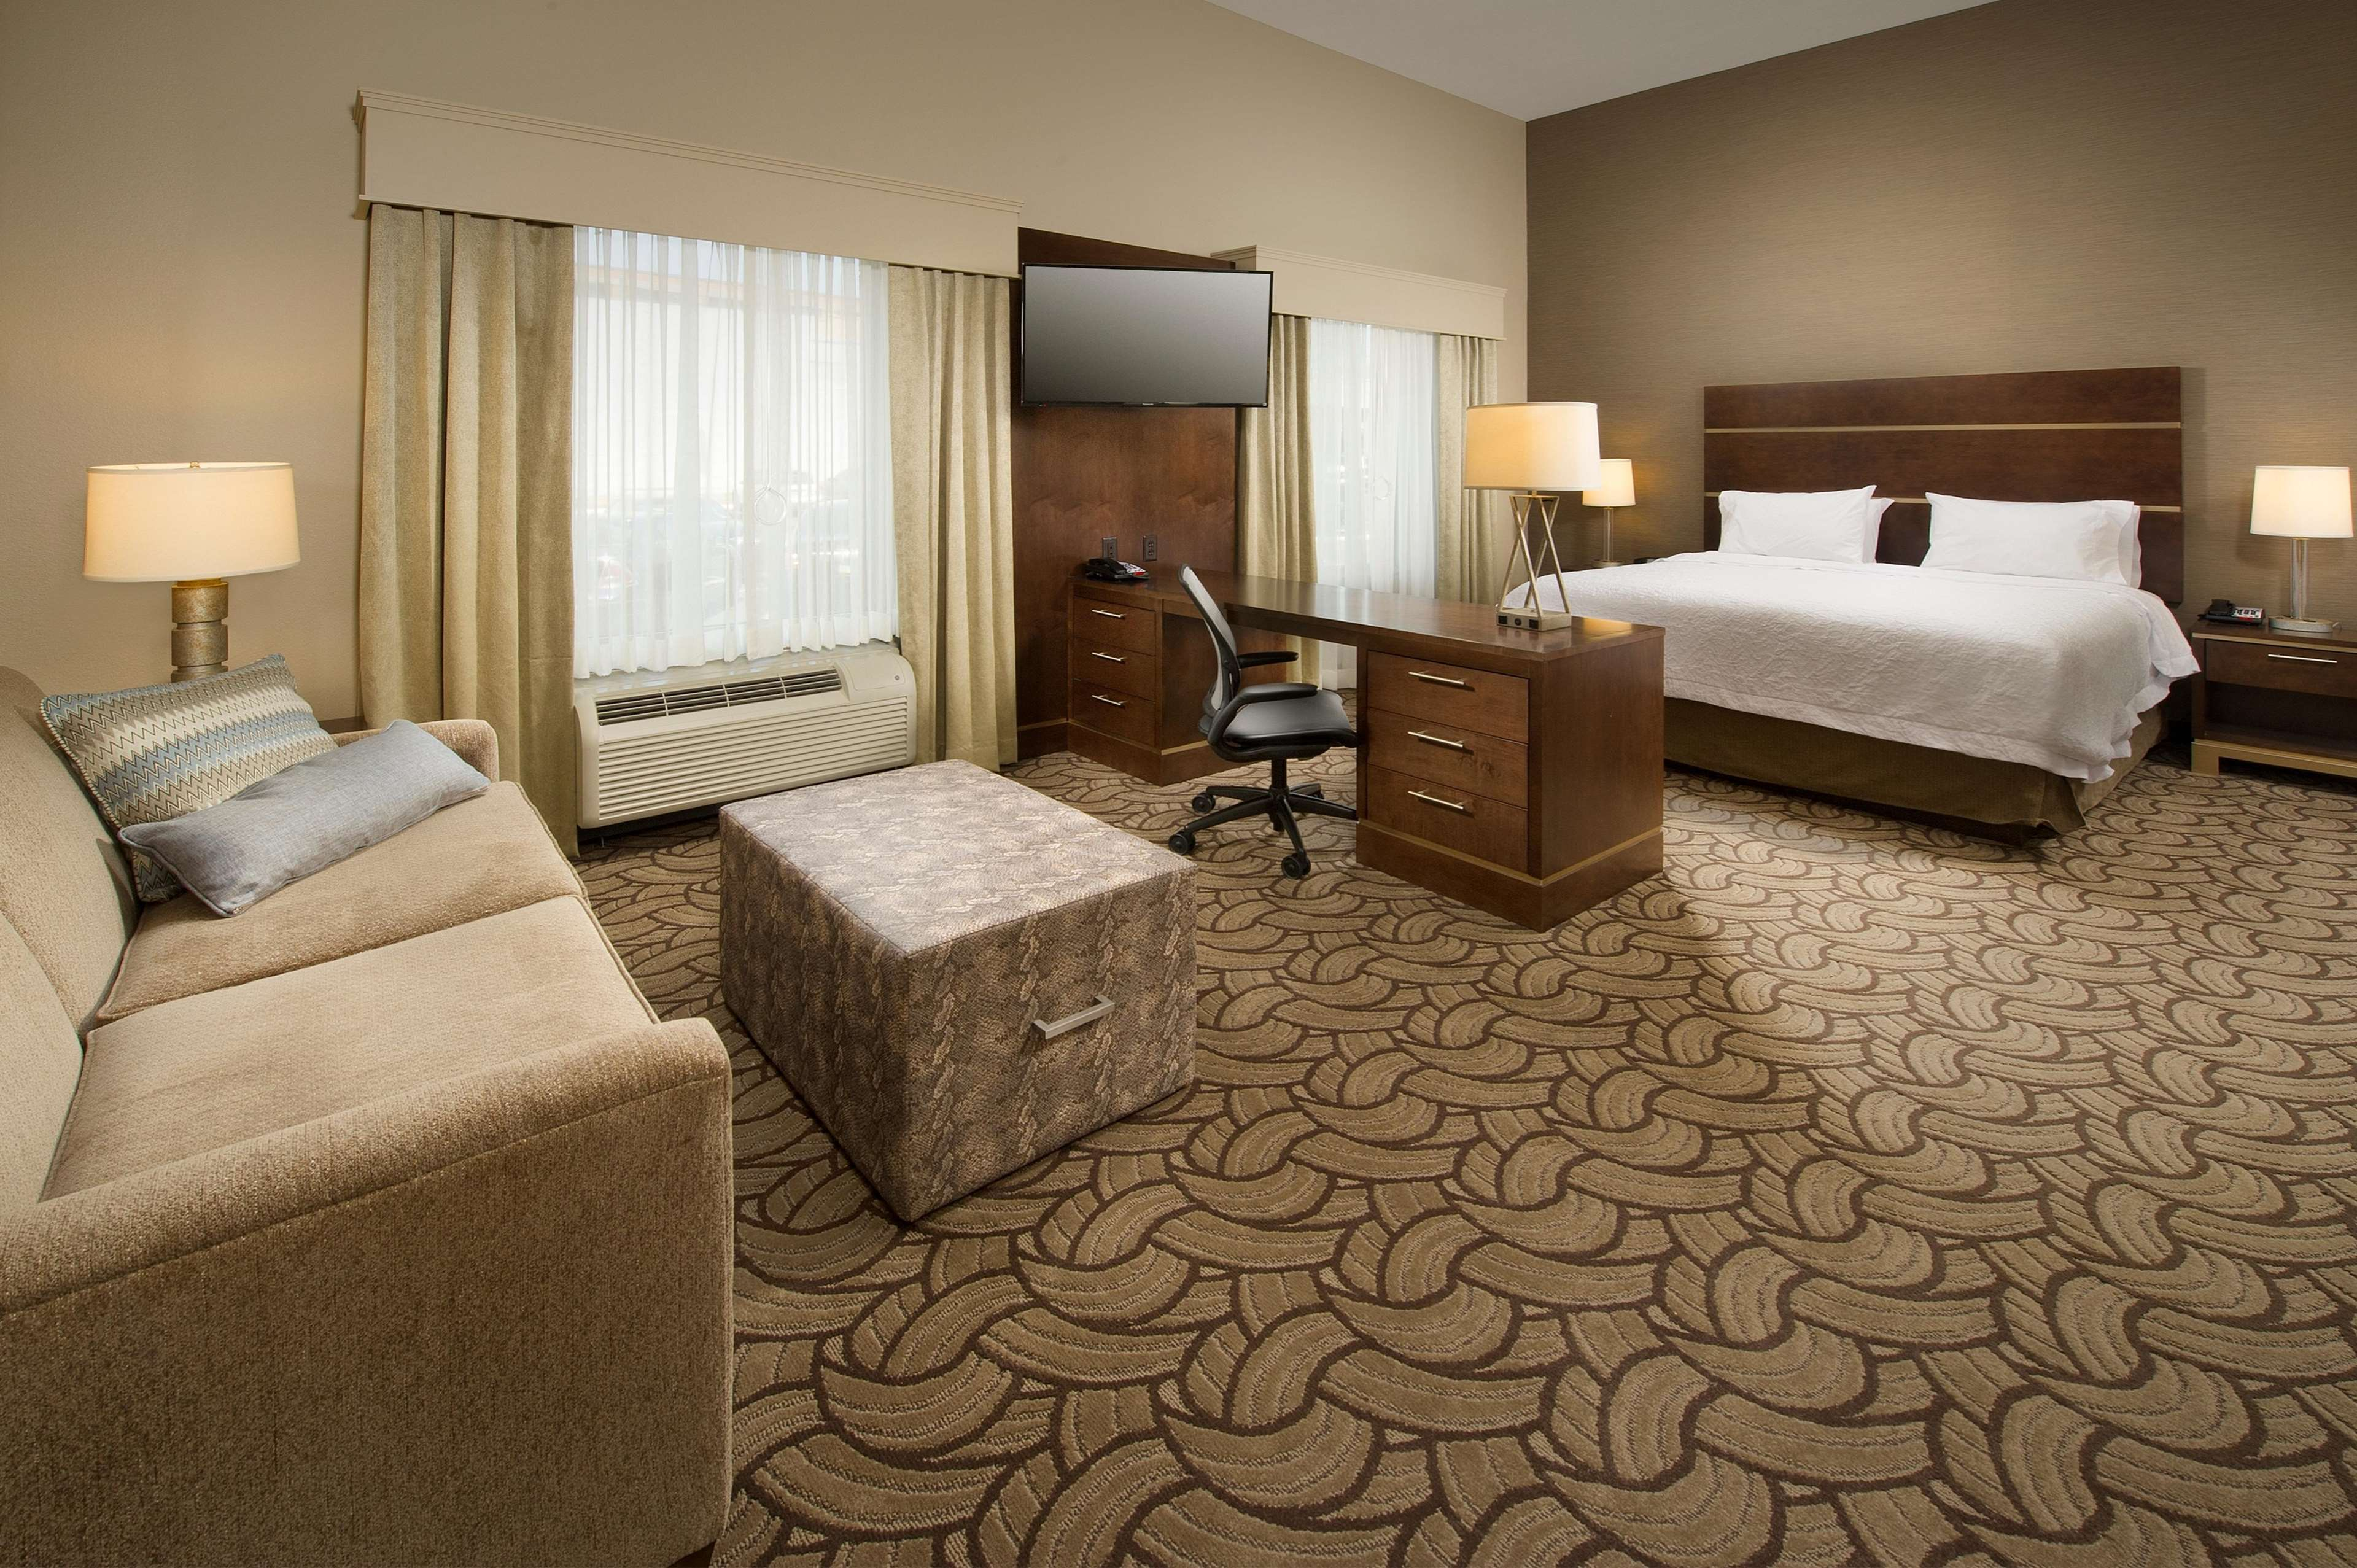 Hampton Inn & Suites San Antonio-Downtown/Market Square image 19